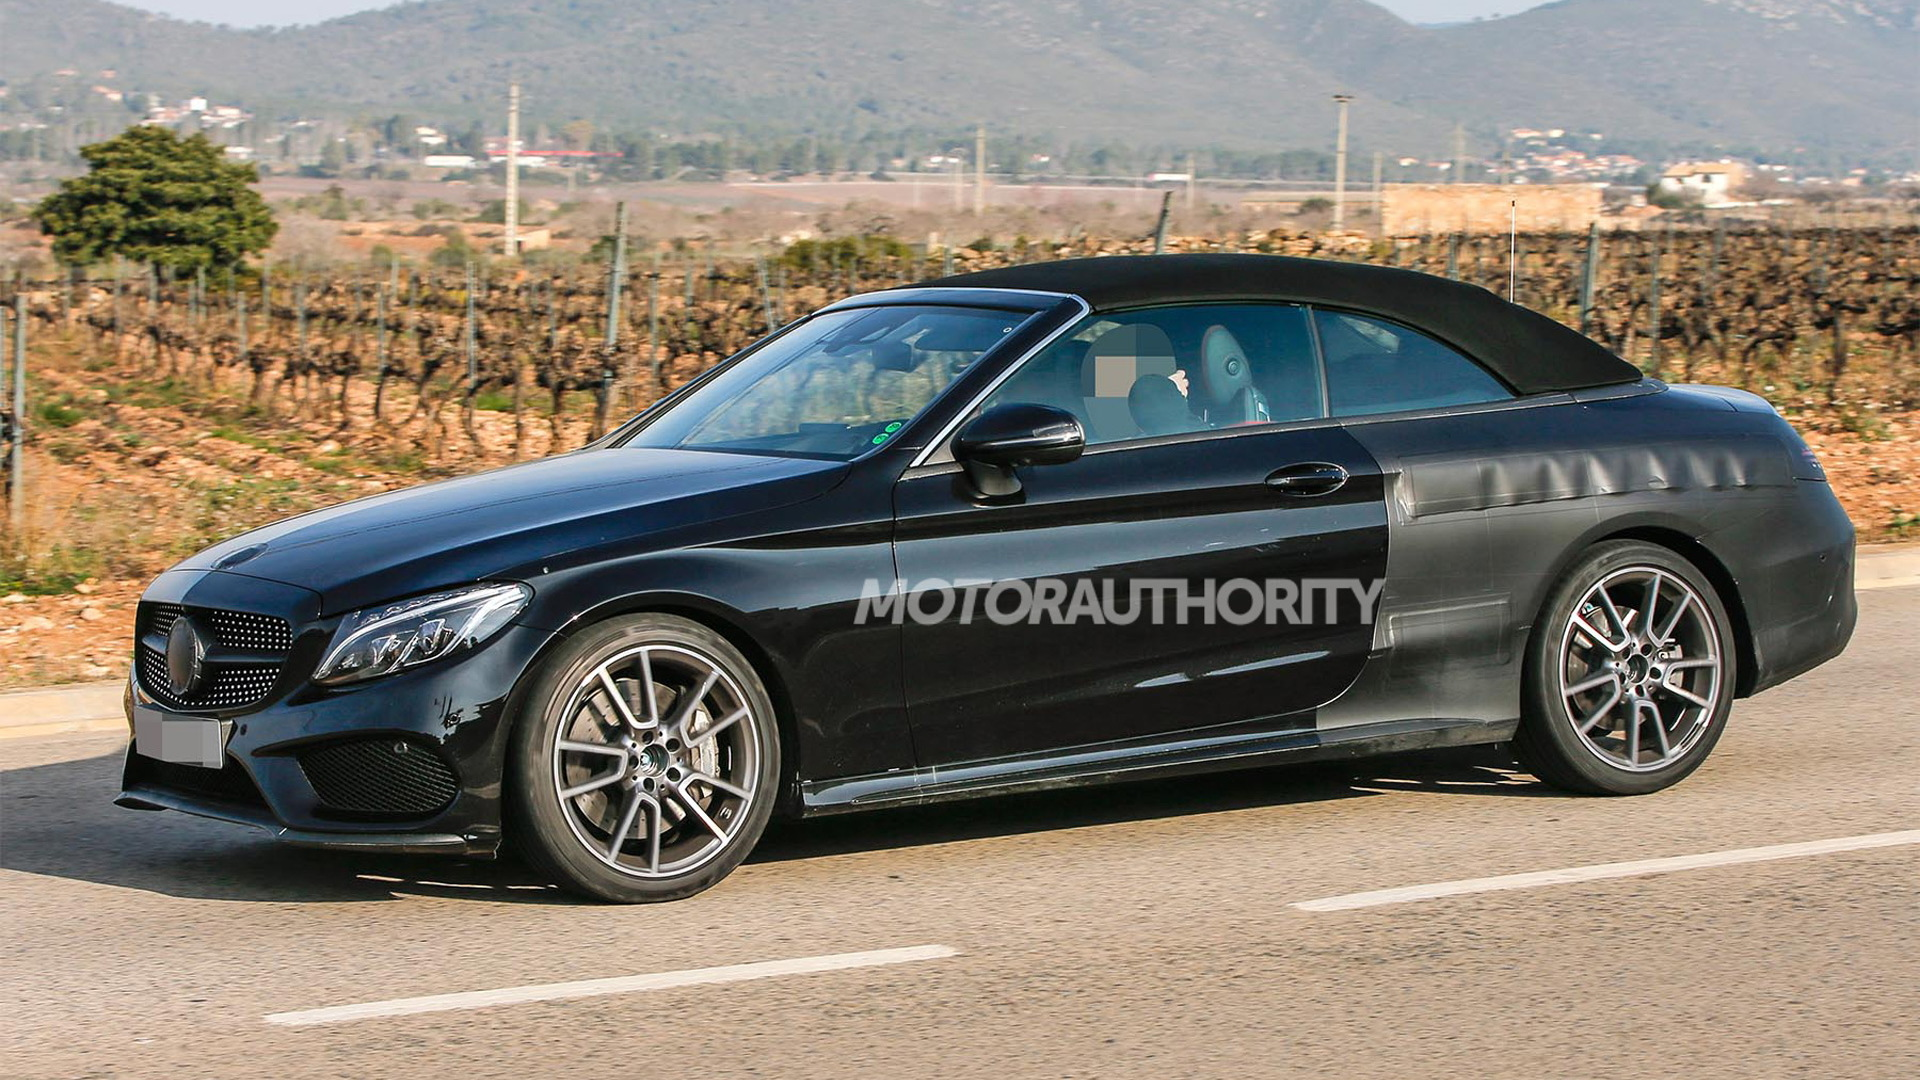 2017 Mercedes-AMG C43 Cabriolet spy shots - Image via S. Baldauf/SB-Medien